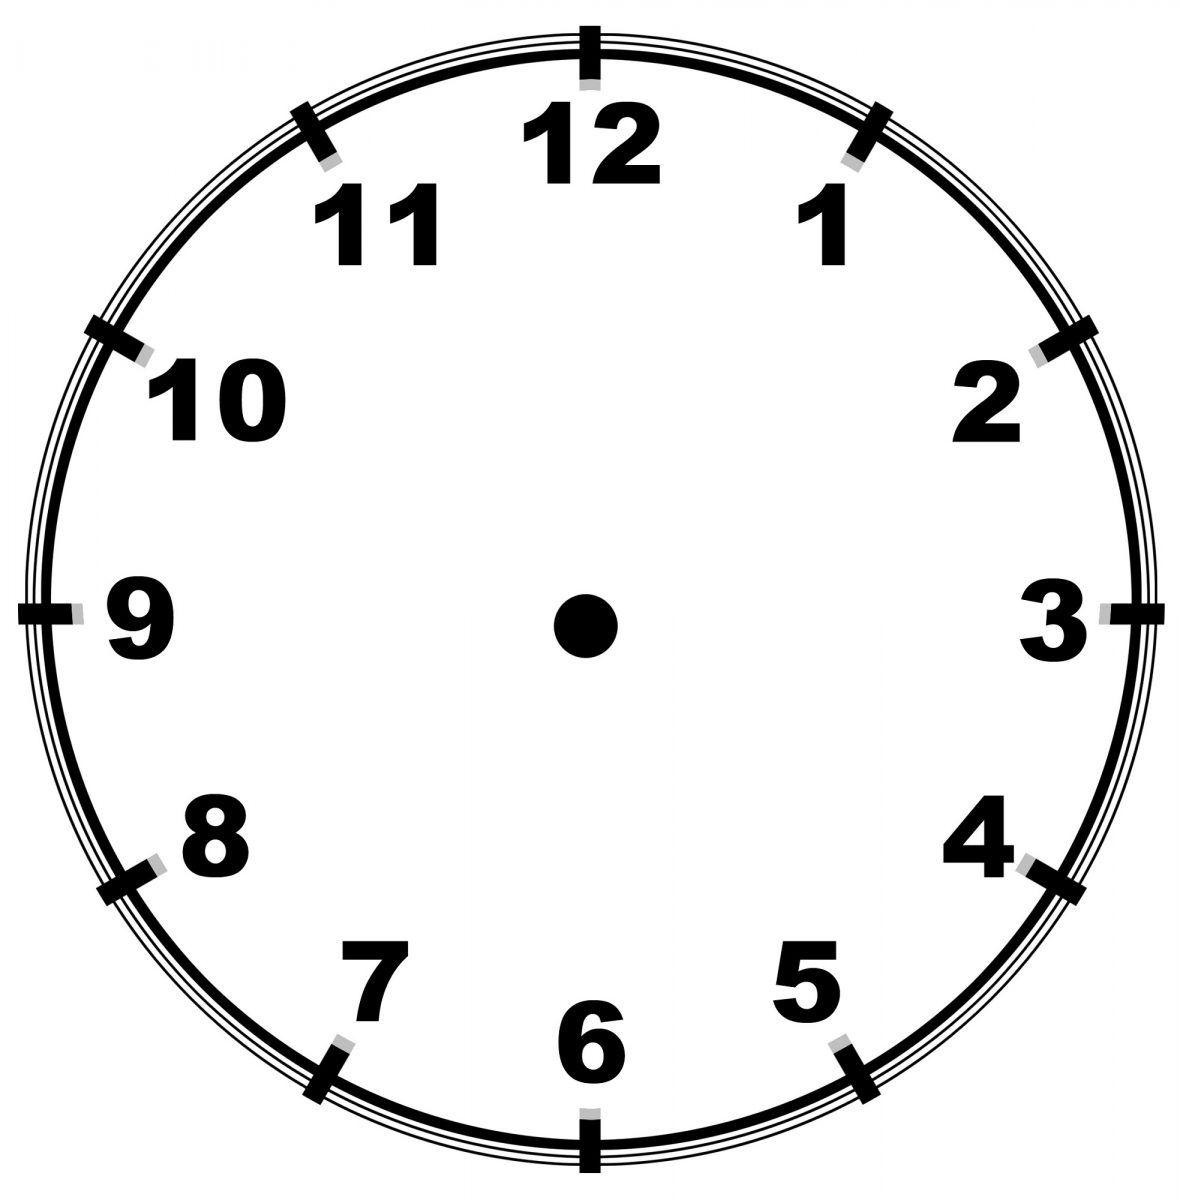 Clock Face Template For Children